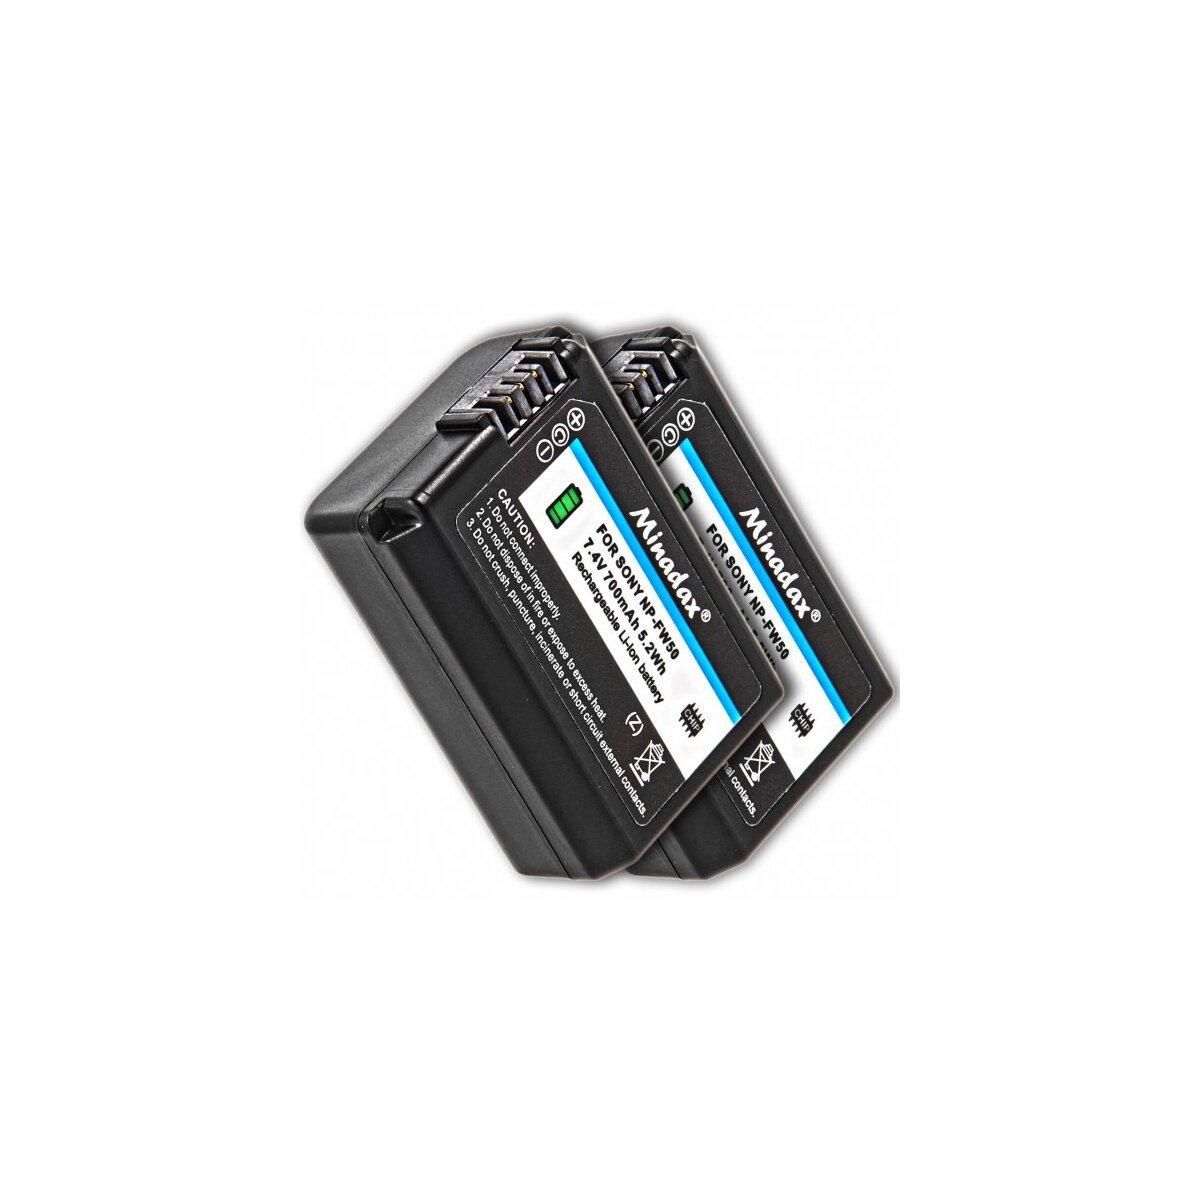 2x Qualitätsakku kompatibel für Sony Ersatz für NP-FW50 - Li-Ion Akku fuer Sony A55, A33, A35, A37, NEX-6, NEX-7 Serie, NEX-3 Serie, NEX-5 Serie